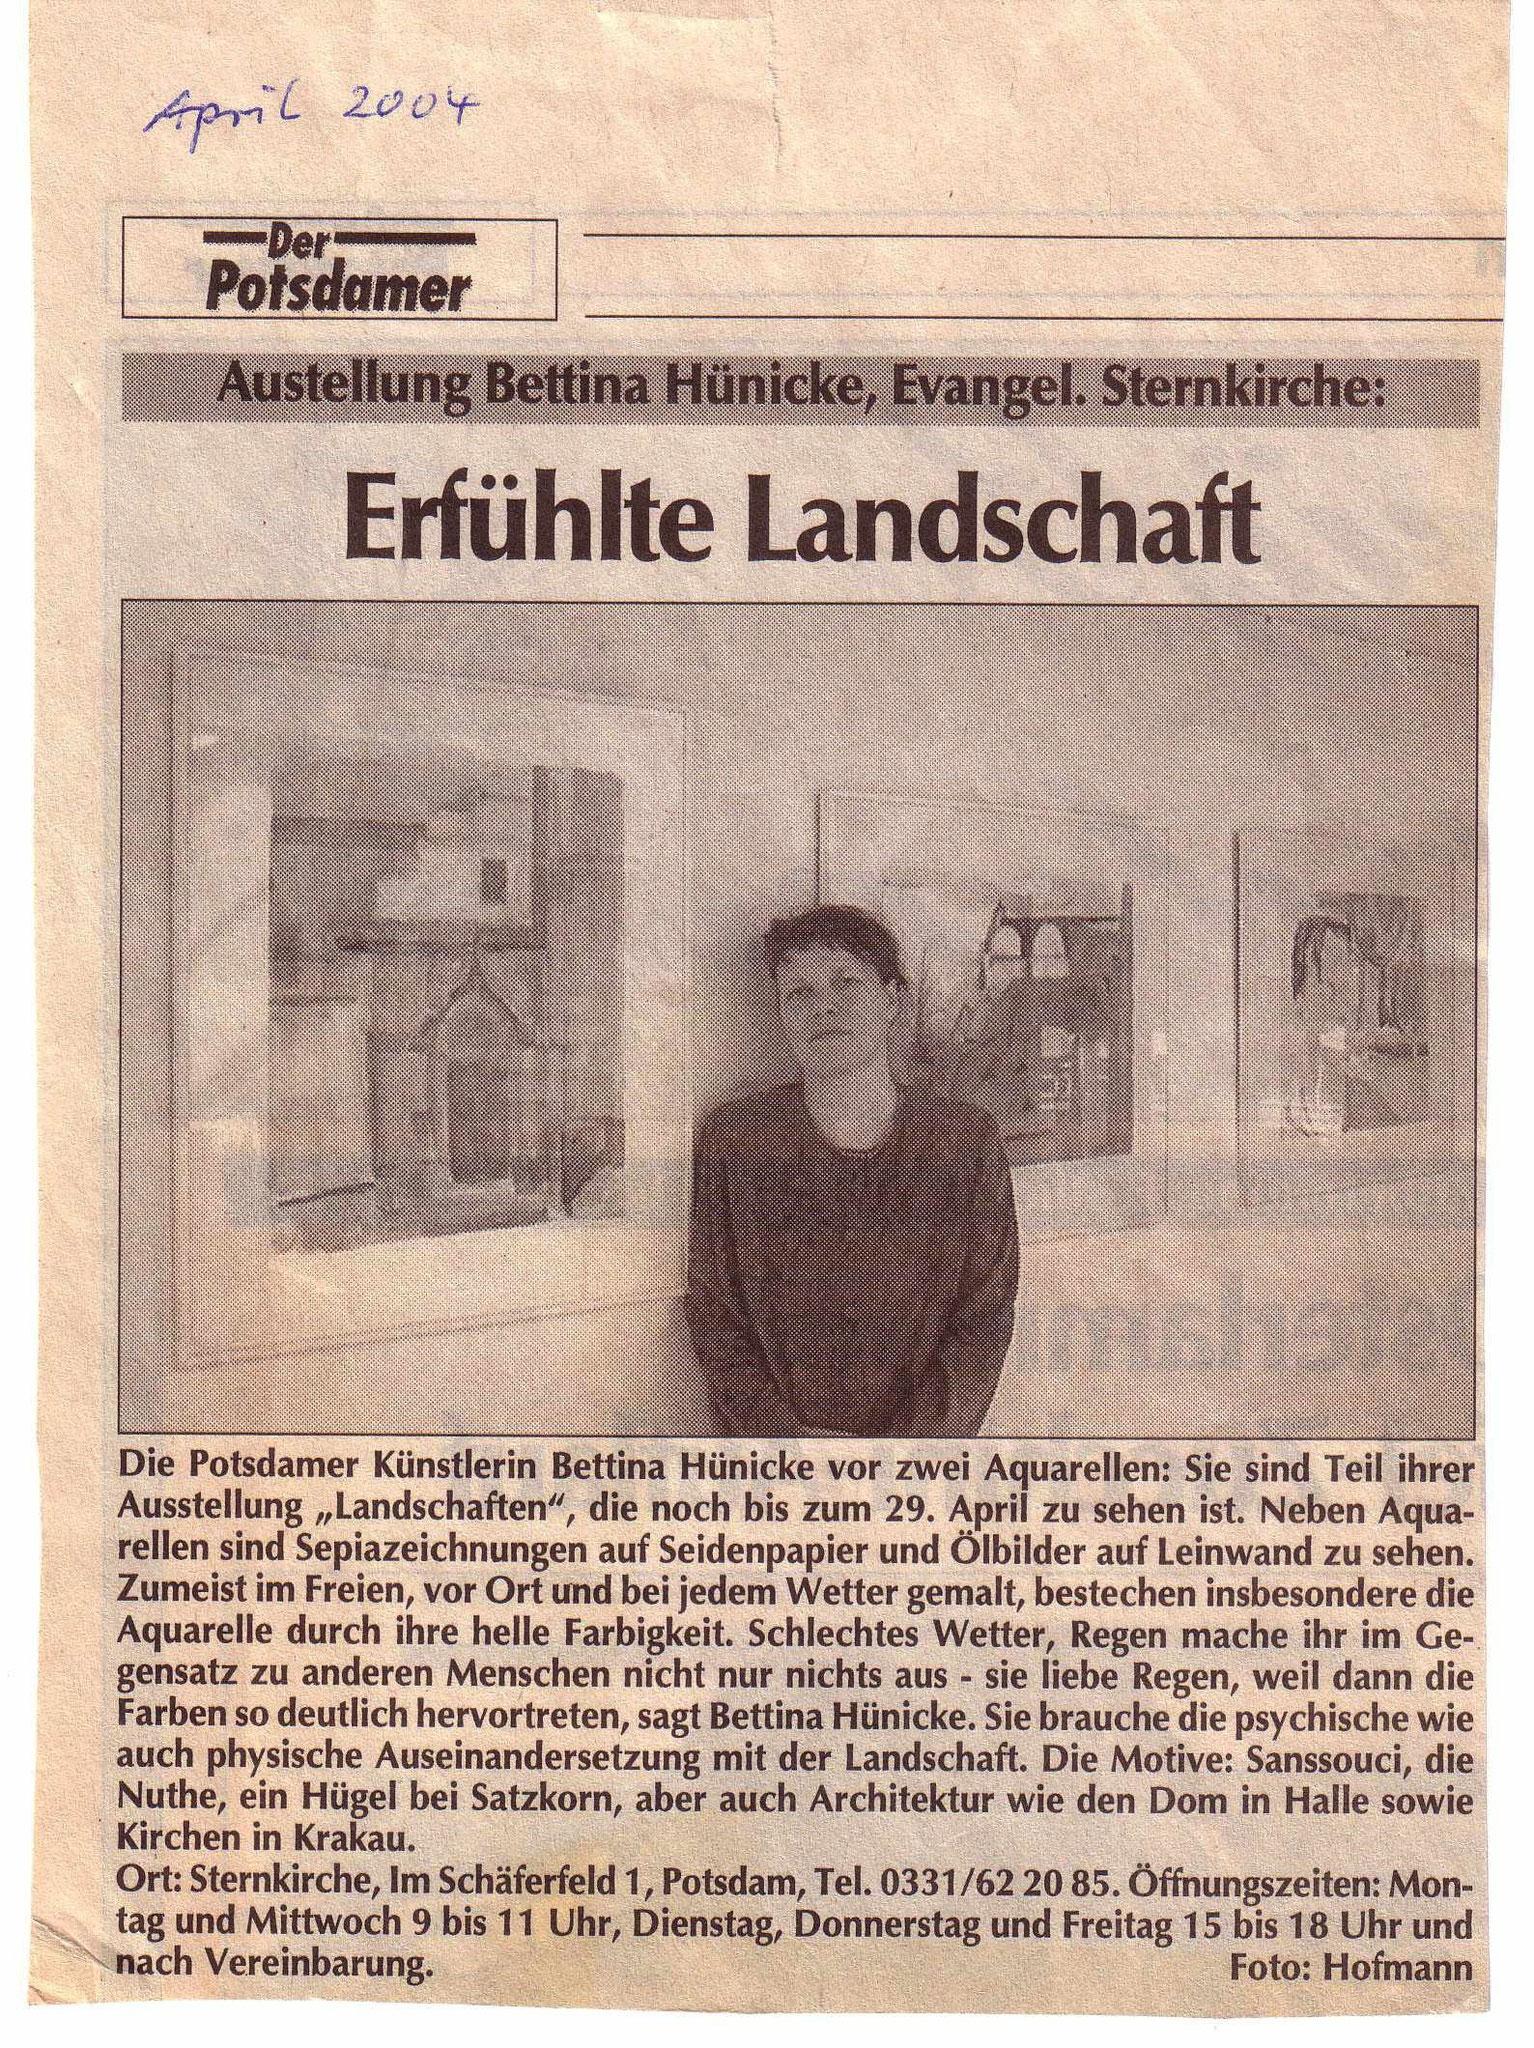 April 2004: Erfühlte Landschaft Der Potsdamer, Beitrag von Hofmann